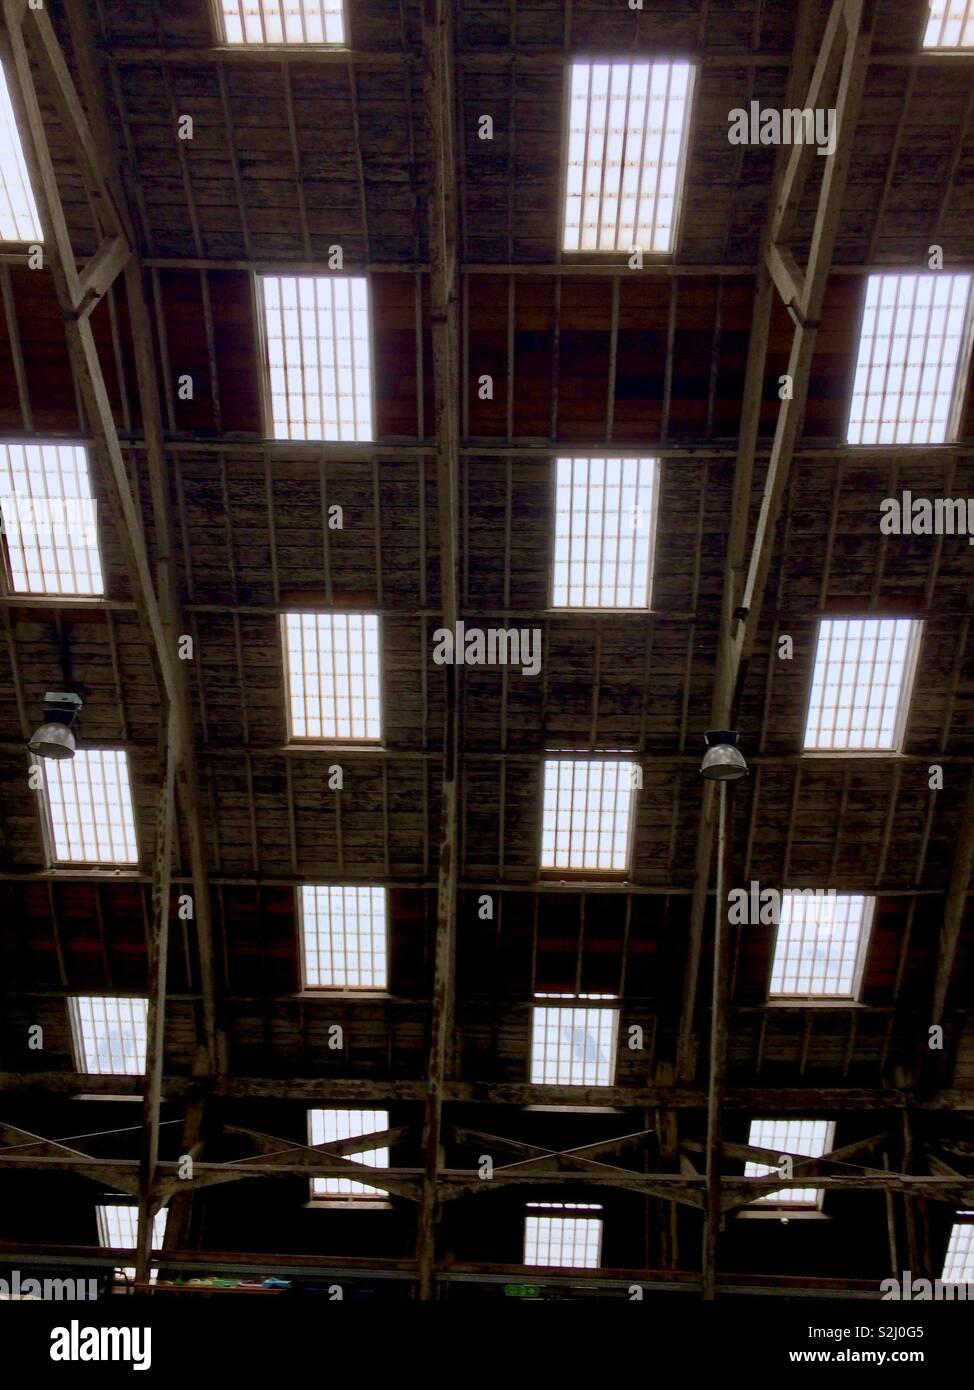 Ceiling at Chatham Historic Dockyard - Stock Image